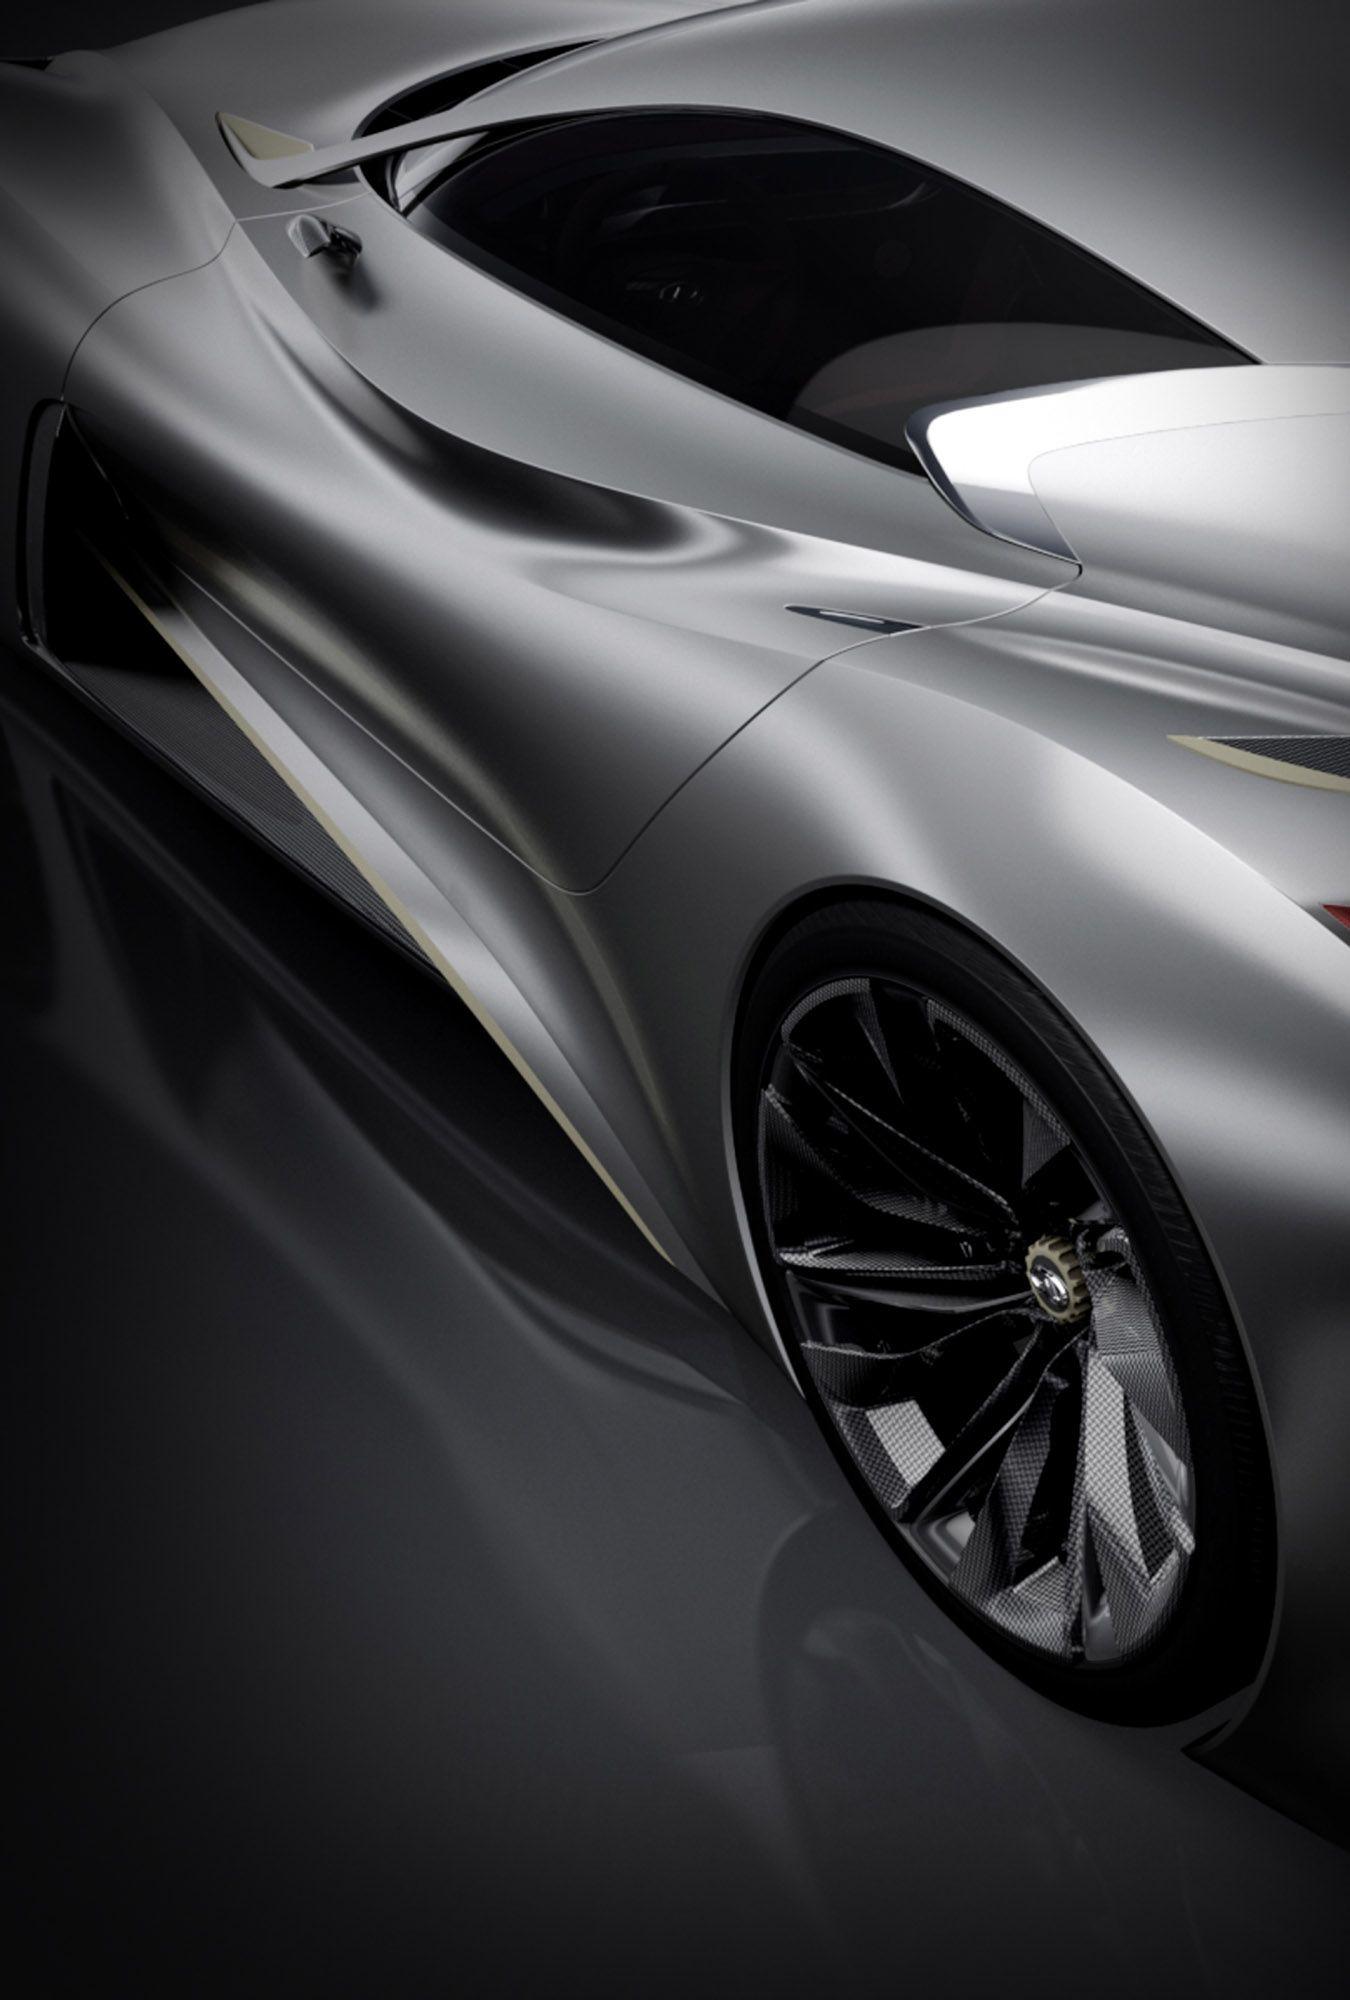 Gran Turismo Vision Concept Infiniti, introducing the